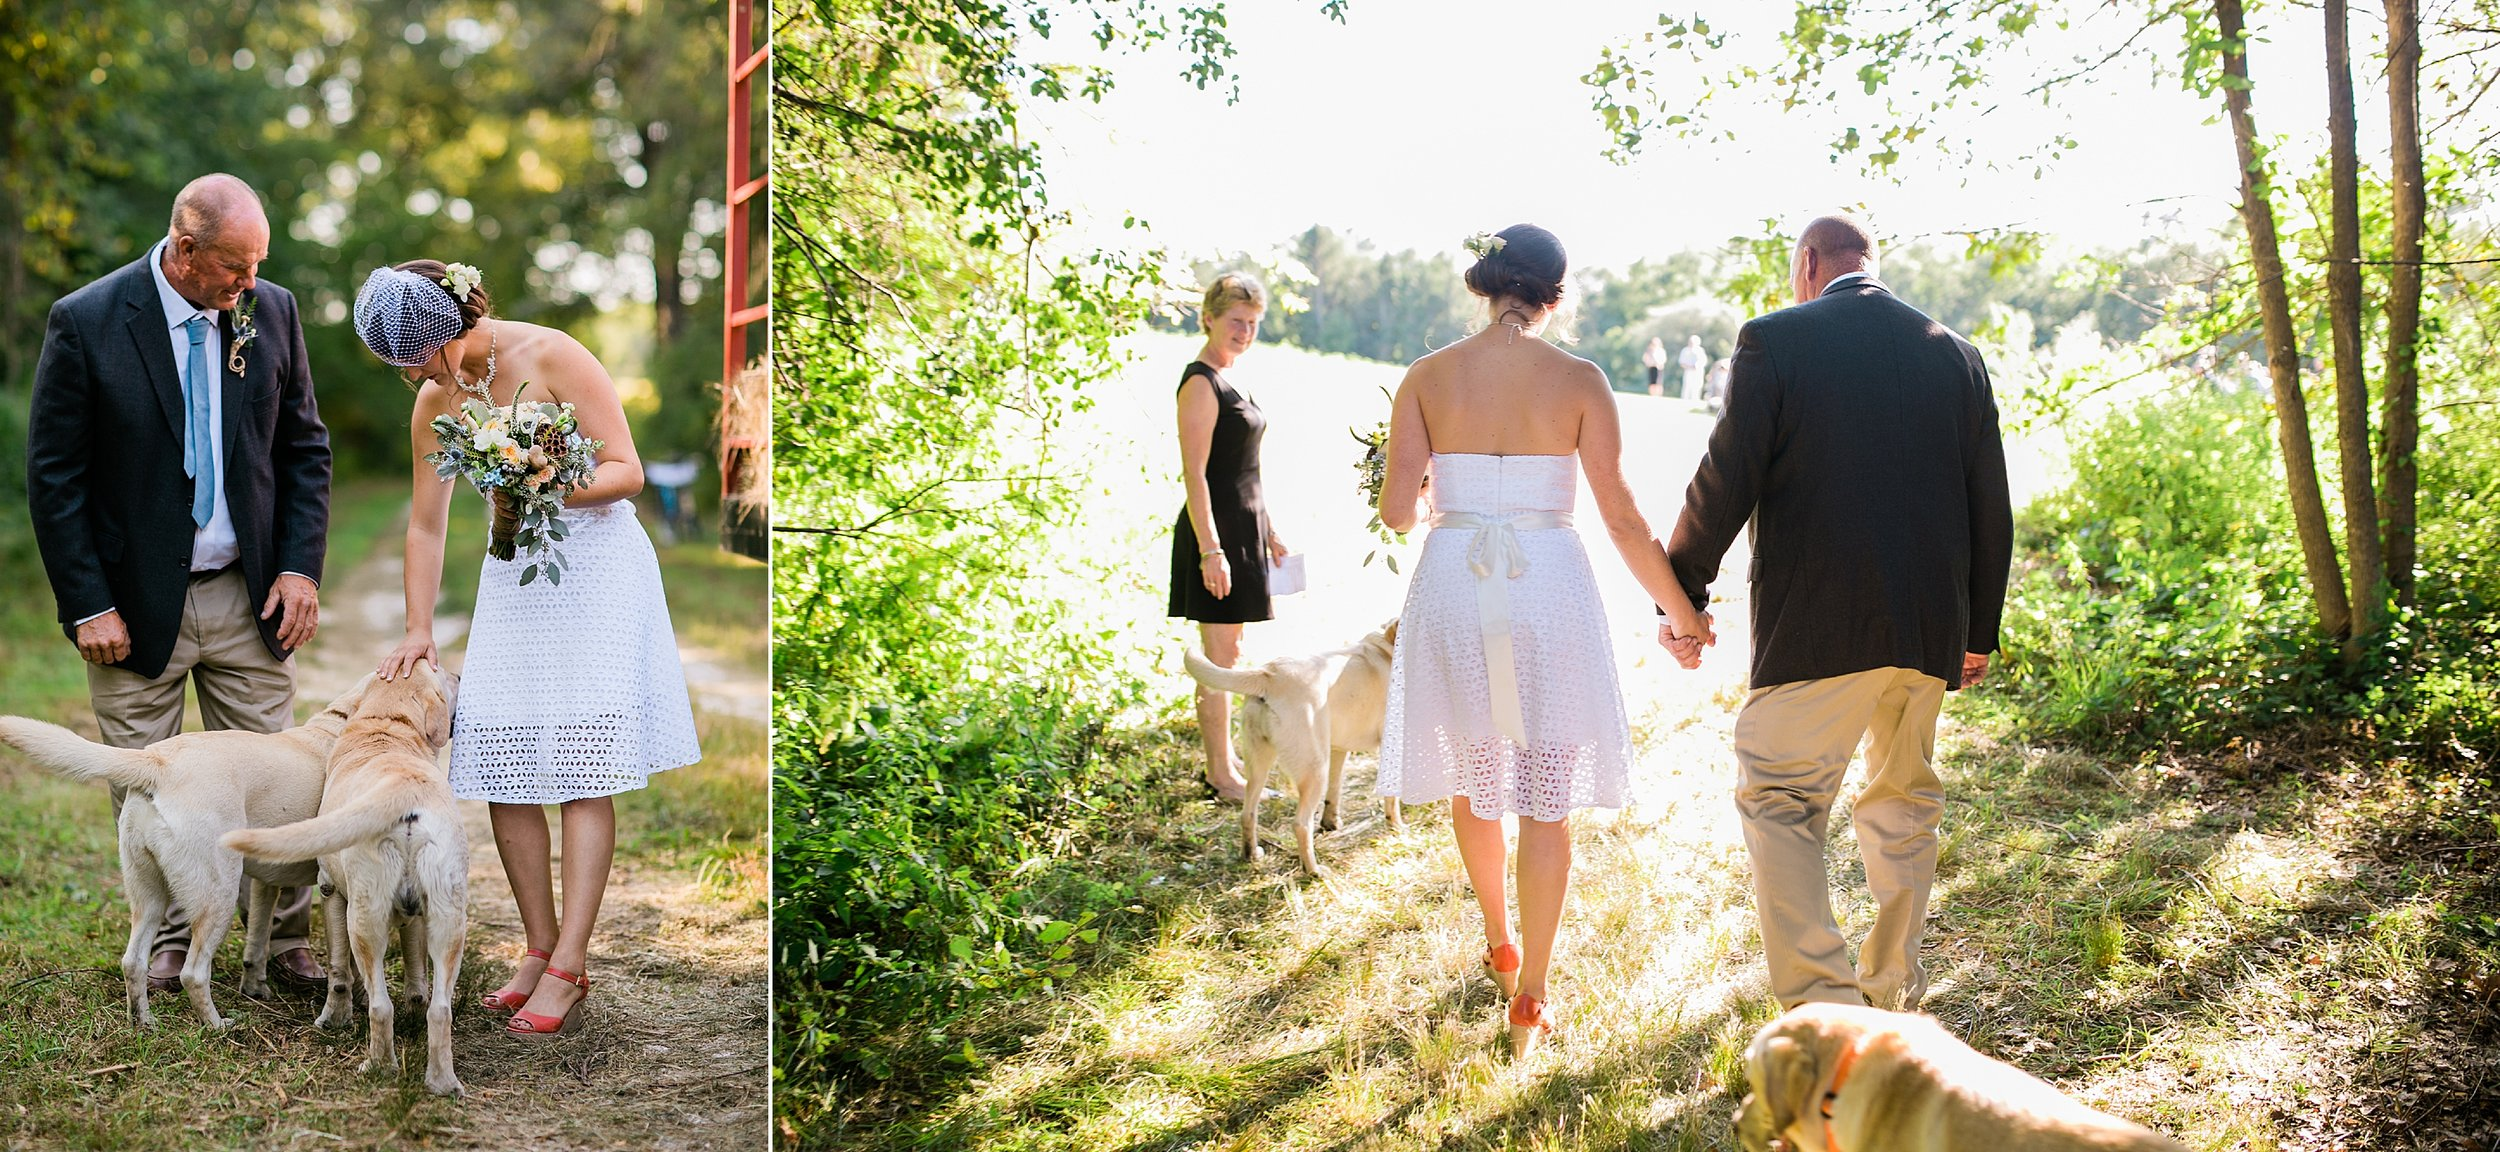 030 los angeles wedding photographer.jpg